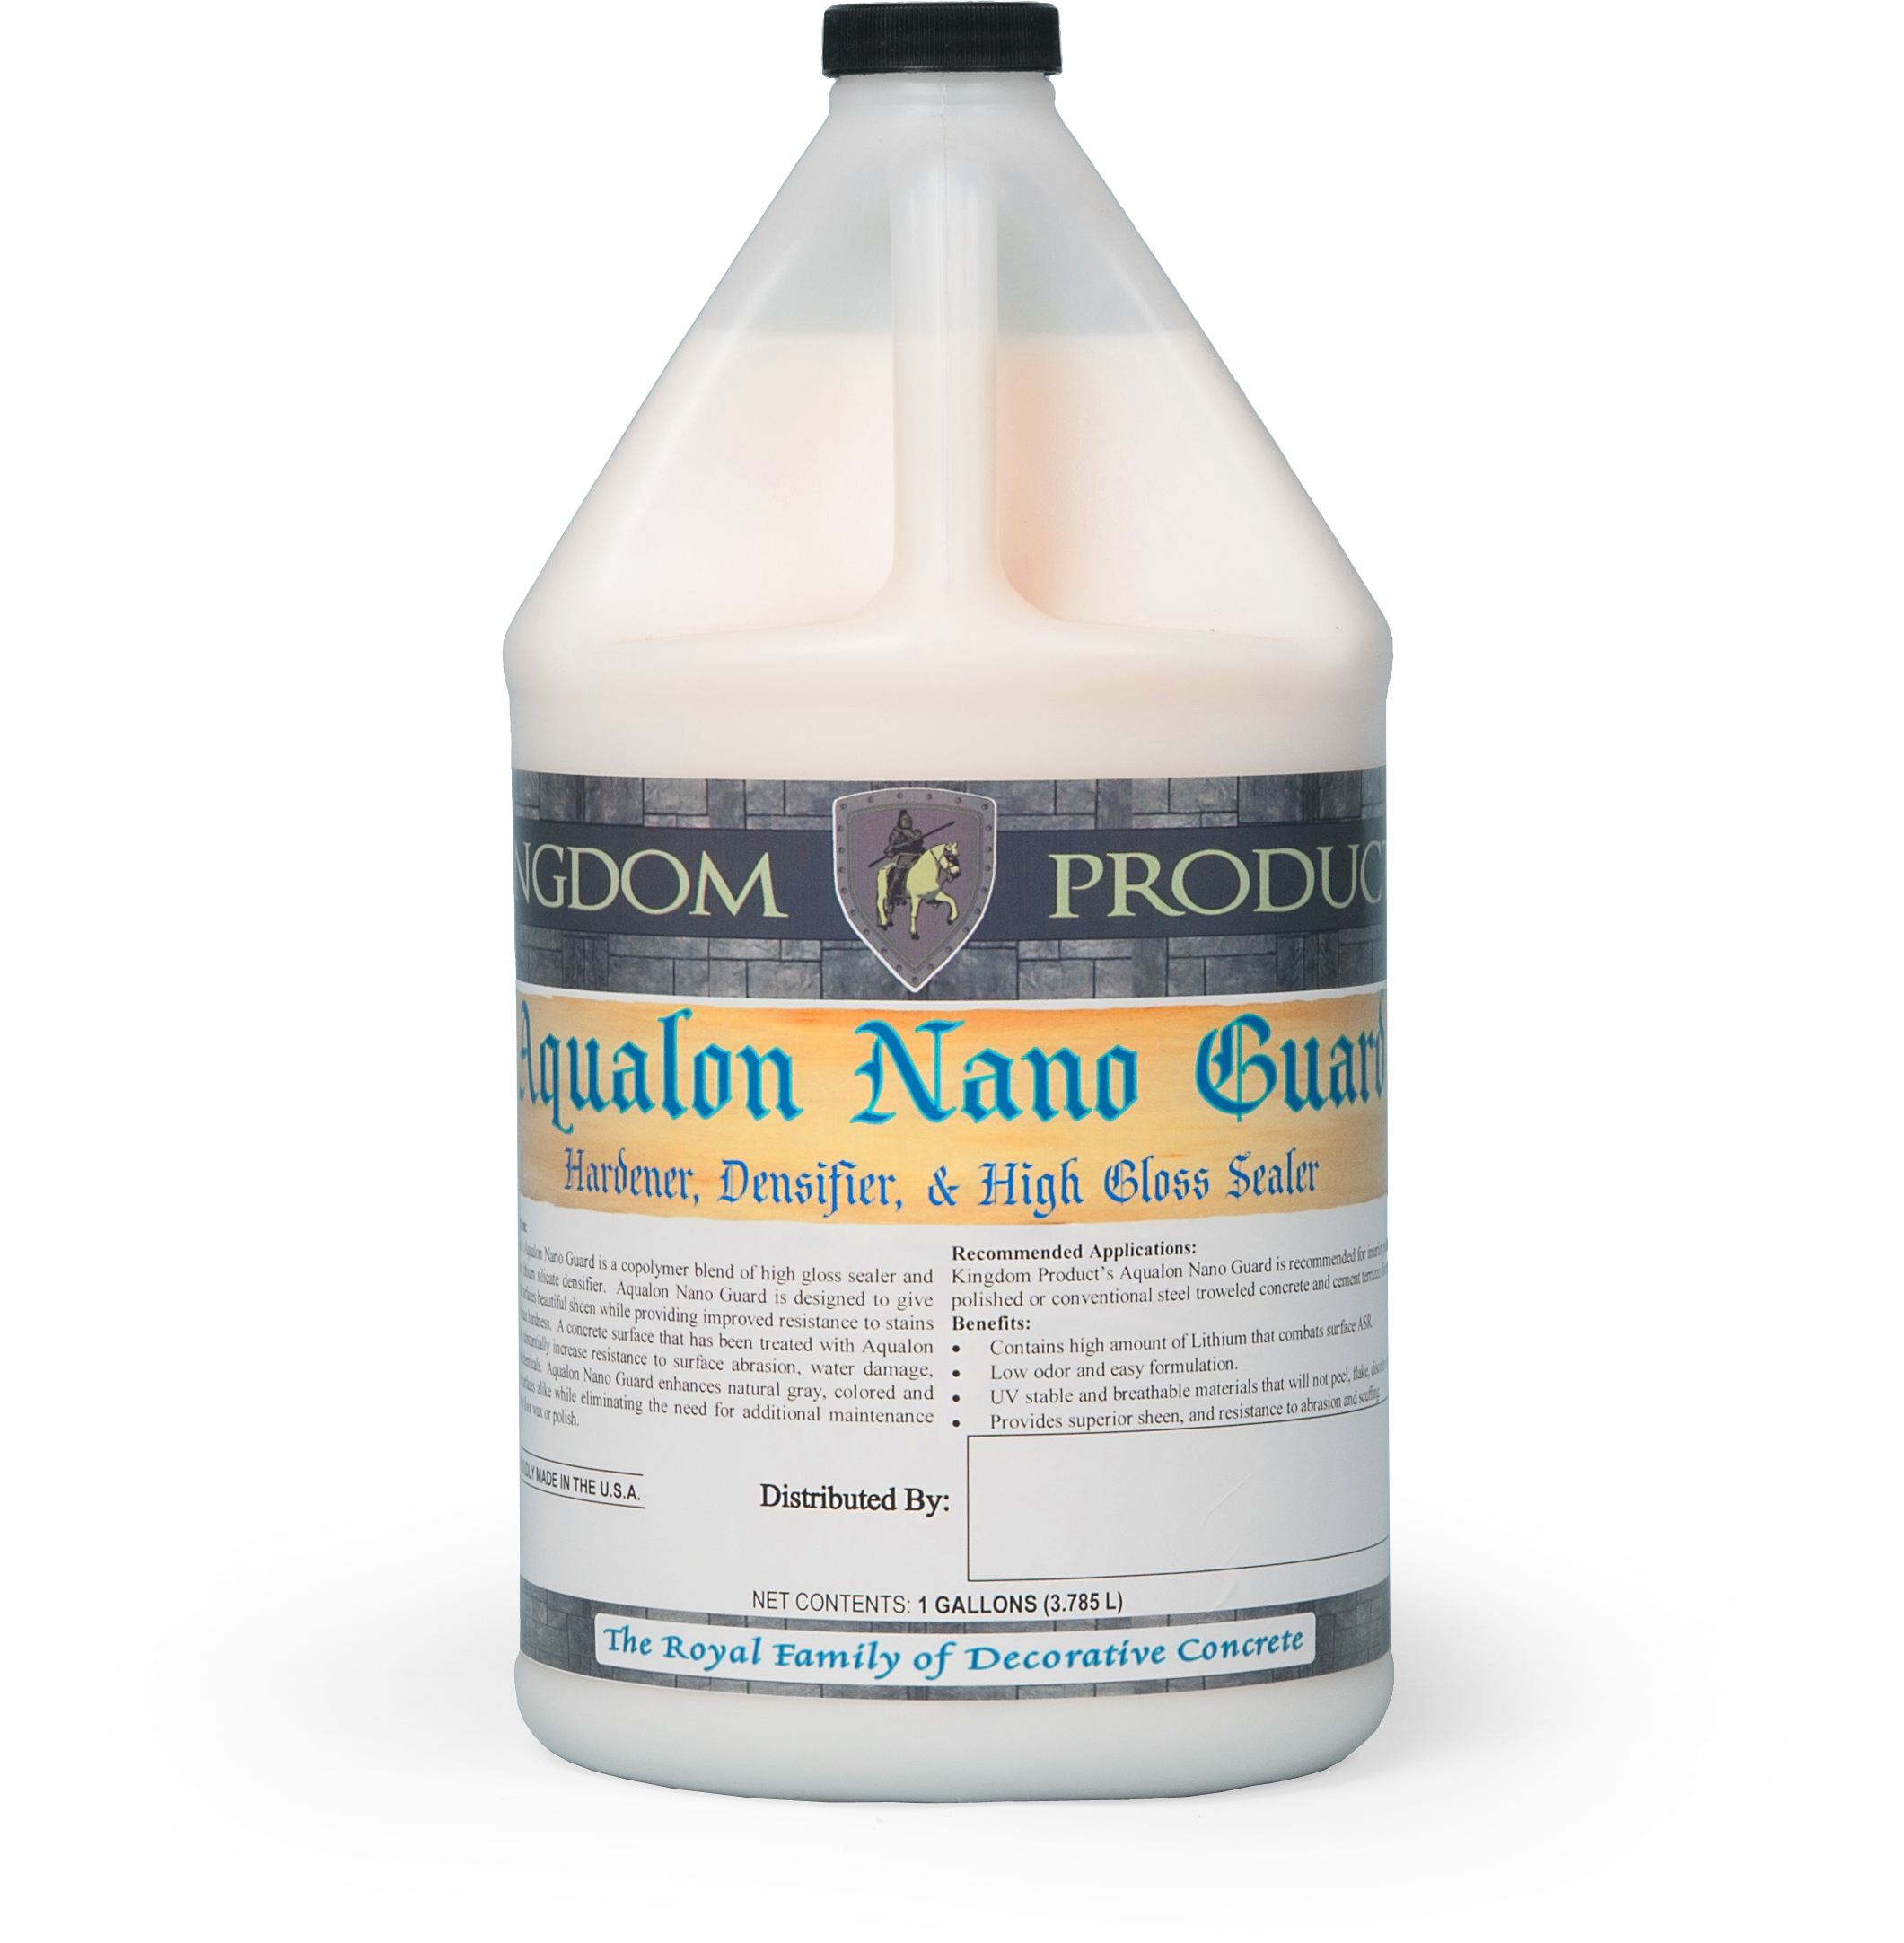 Aqualon Nano Guard-Hardener, Densifier & High Gloss Concrete